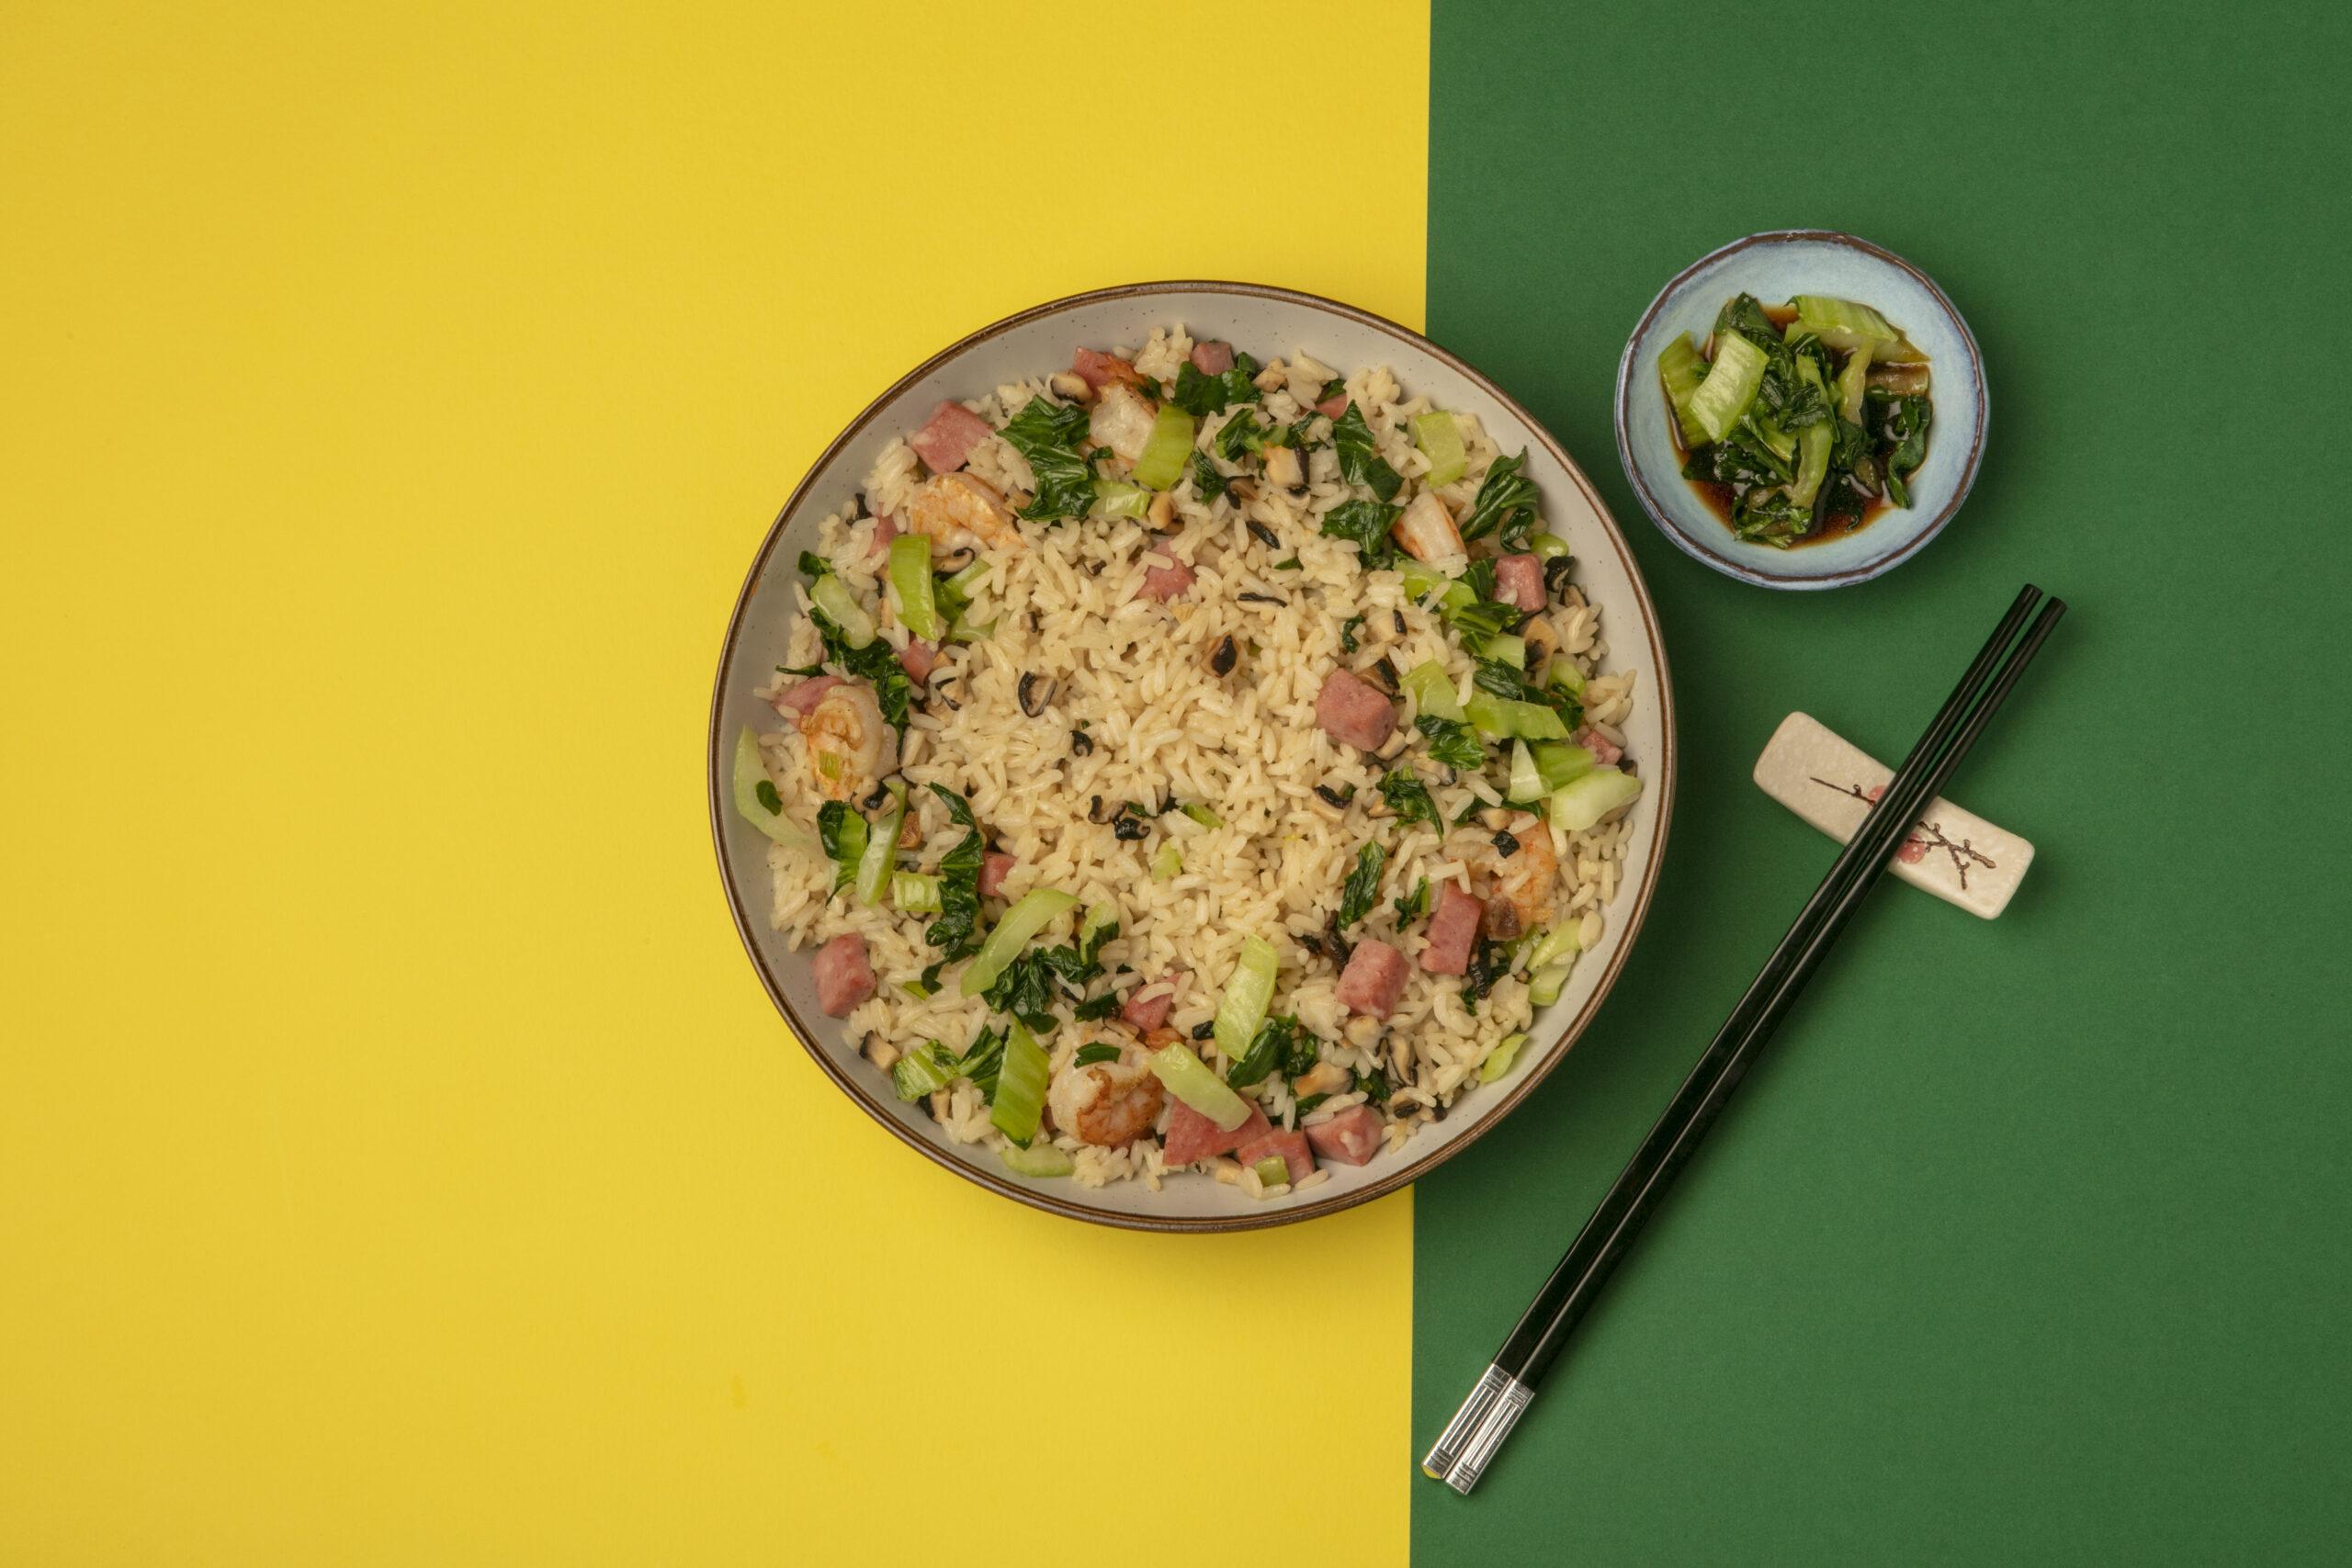 Shanghai Style Stir Fried Rice